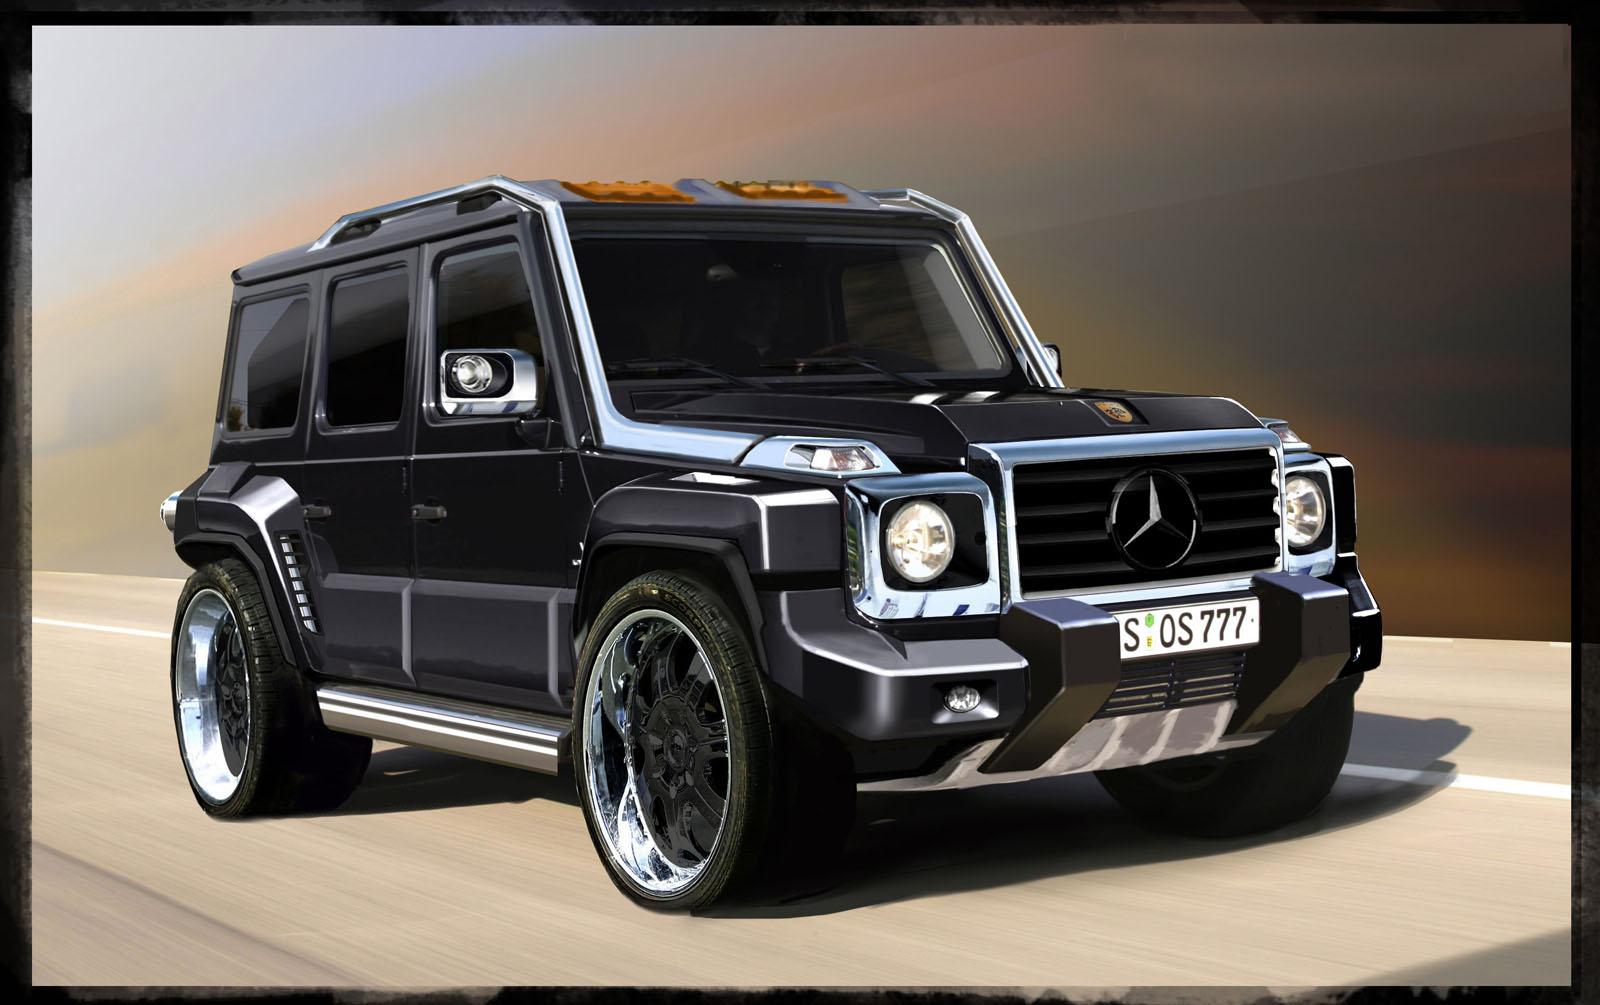 Car & Bike Fanatics: Tuned Mercedes Benz G550